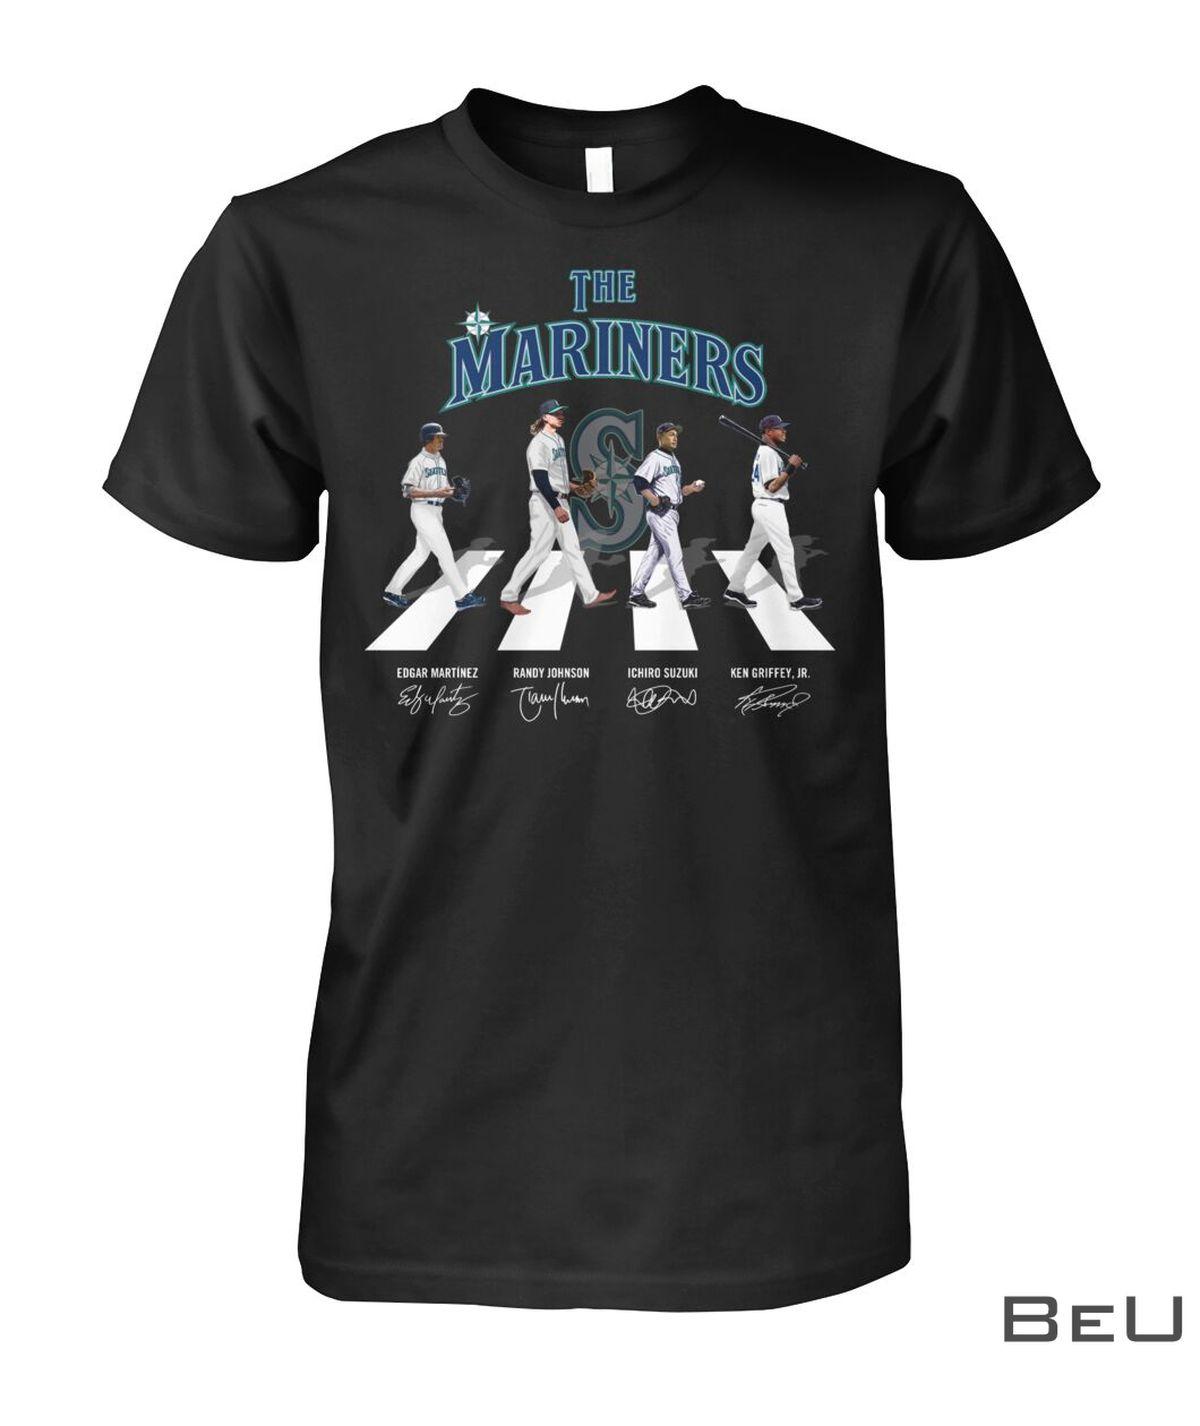 The Mariners Edgar Martinez Randy Johnson Ichiro Suzuki Ken Griffey Jr Shirt